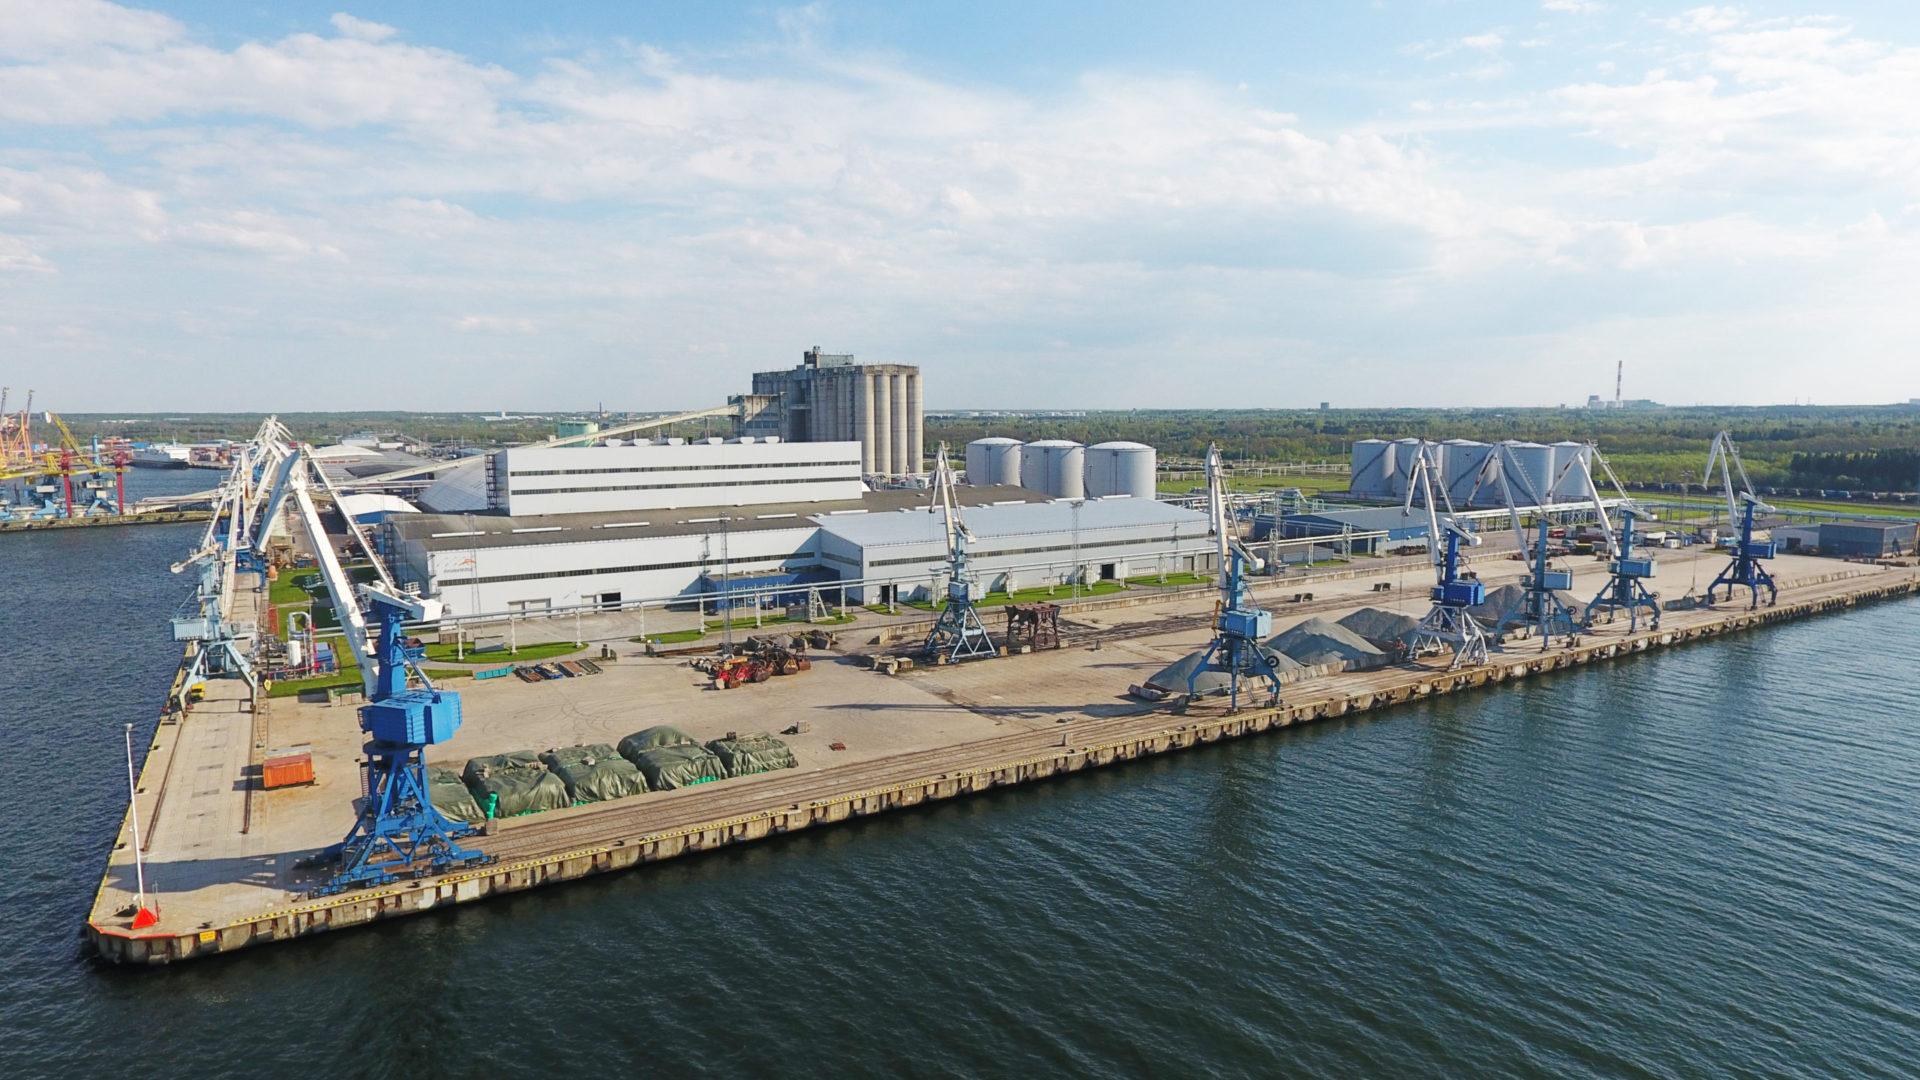 Piers 6-6A of port Muuga, Estonia